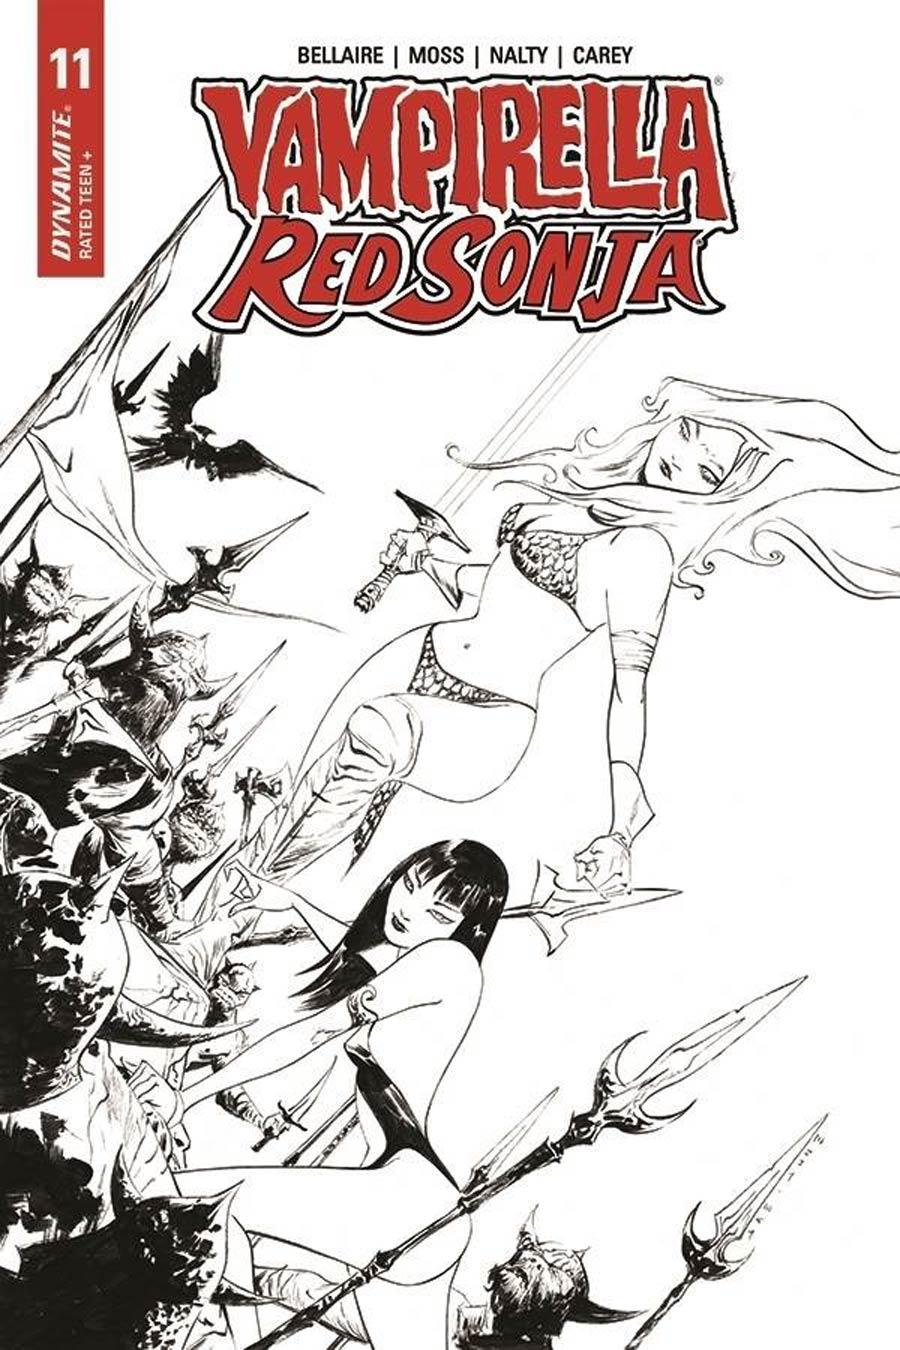 Vampirella Red Sonja #11 Cover N Incentive Jae Lee Black & White Cover